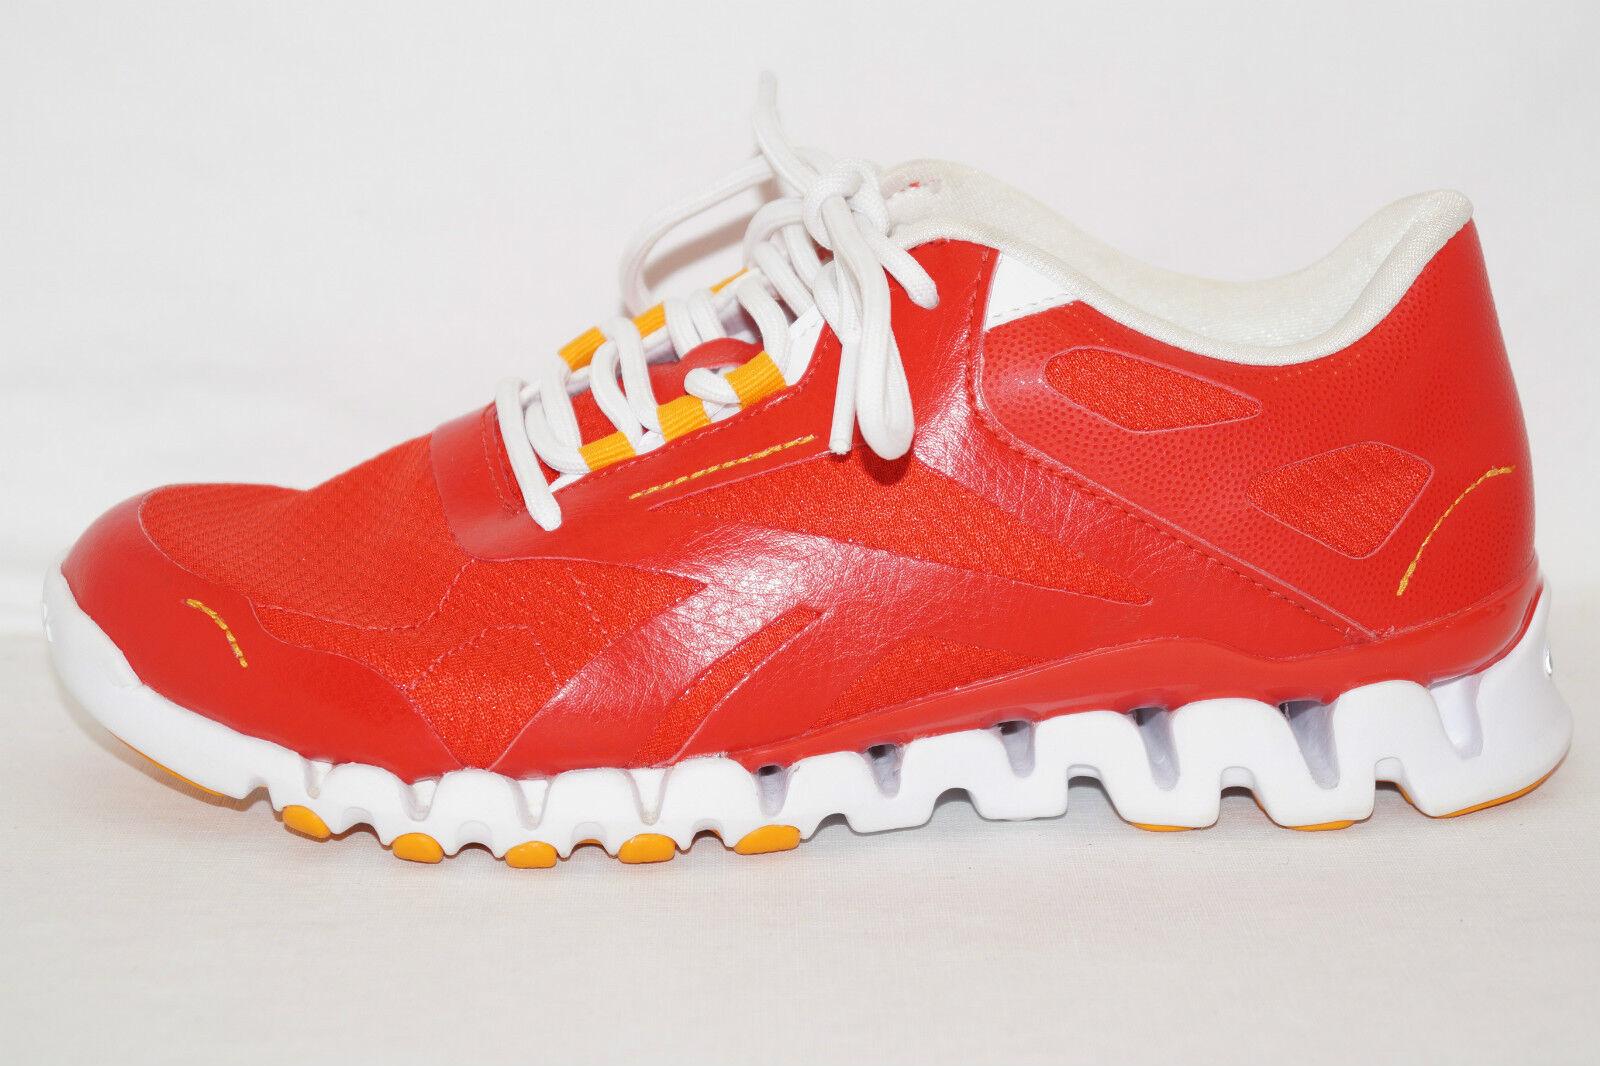 REEBOK ZIGNANO Fuse Fuse Fuse Trainers Gr.38 UK 5 rot Orange J84418 Joggen laufen walken  | Schönes Design  00cfb8